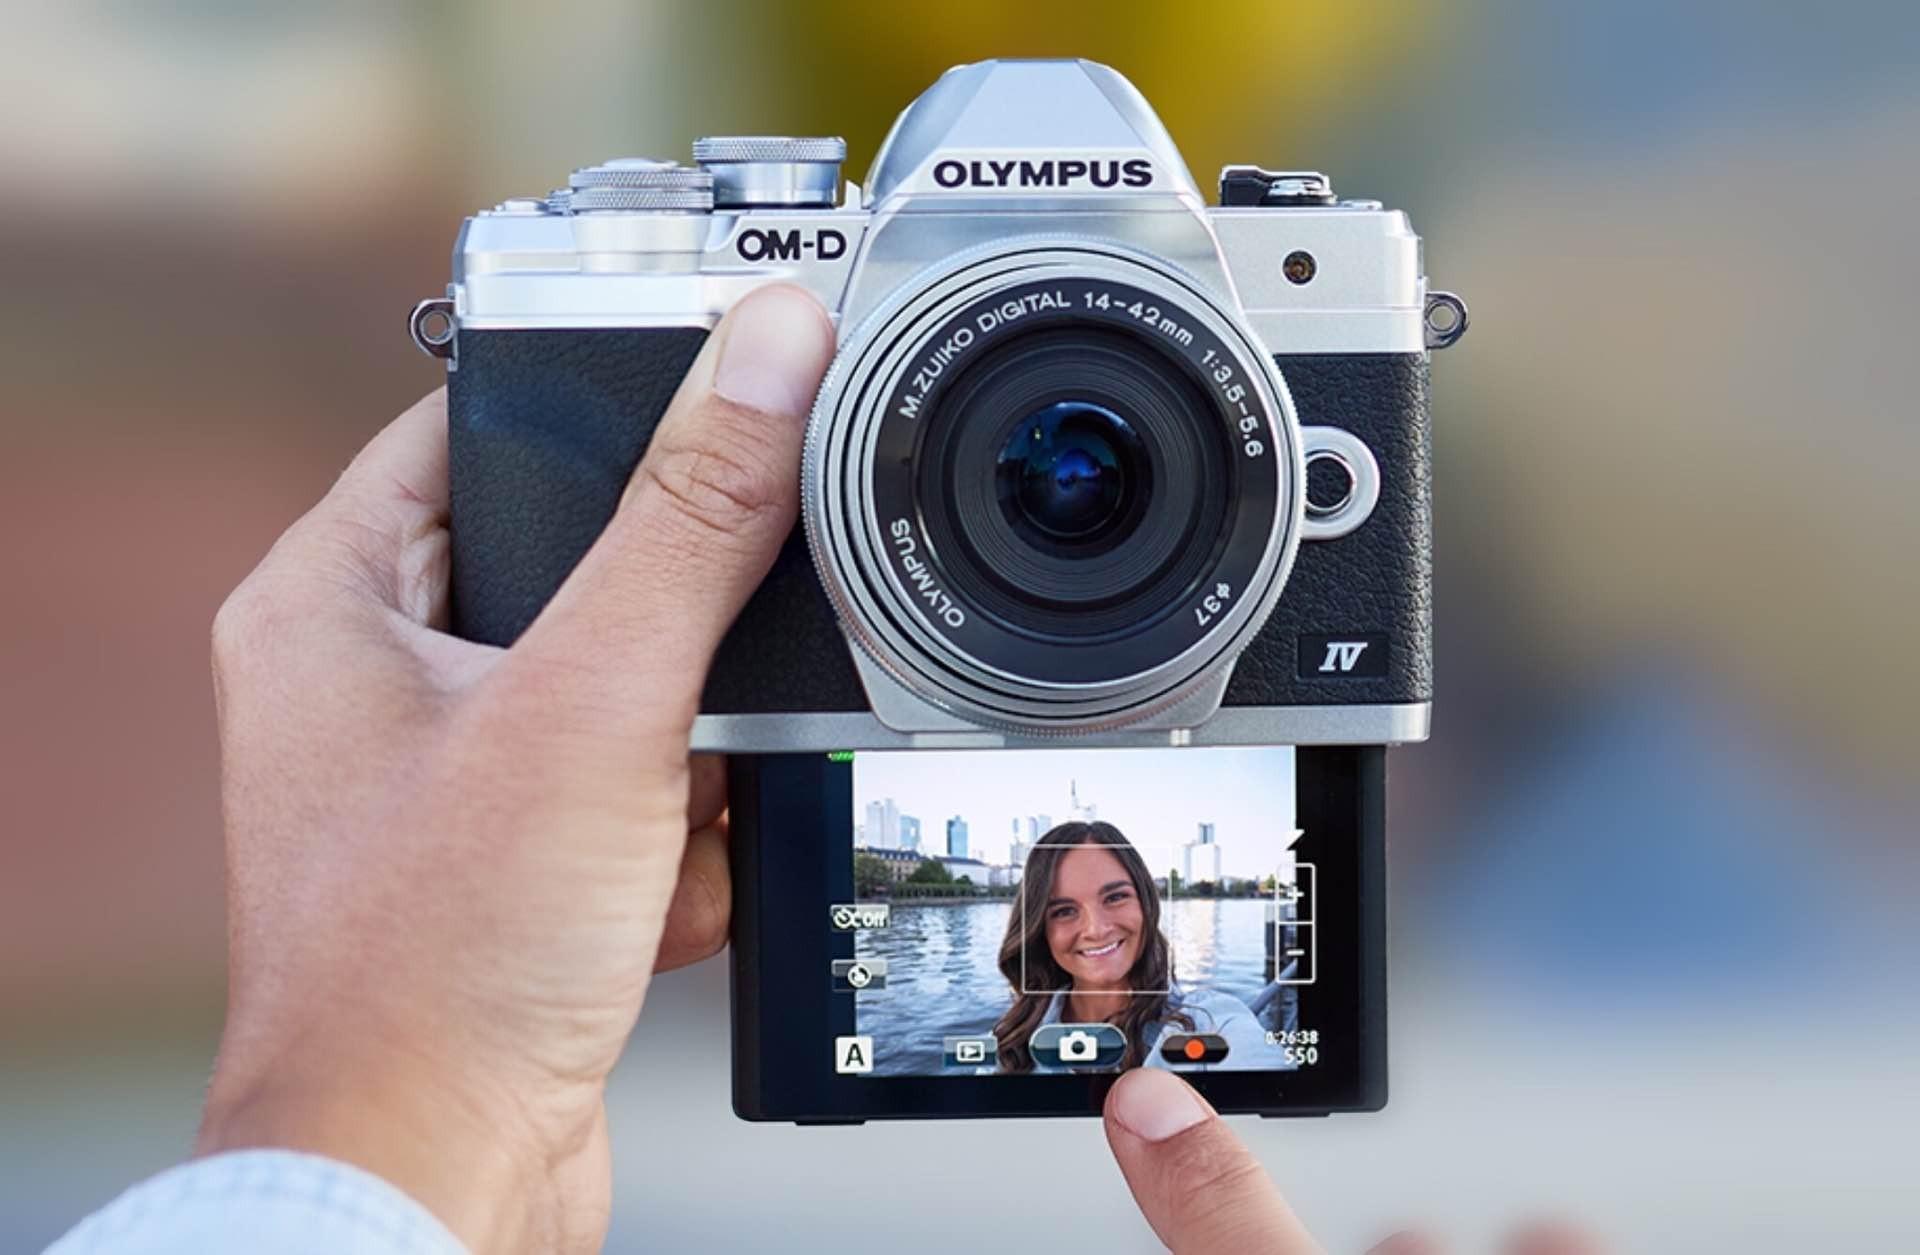 olympus-om-d-e-m10-mark-iv-camera-selfie-display